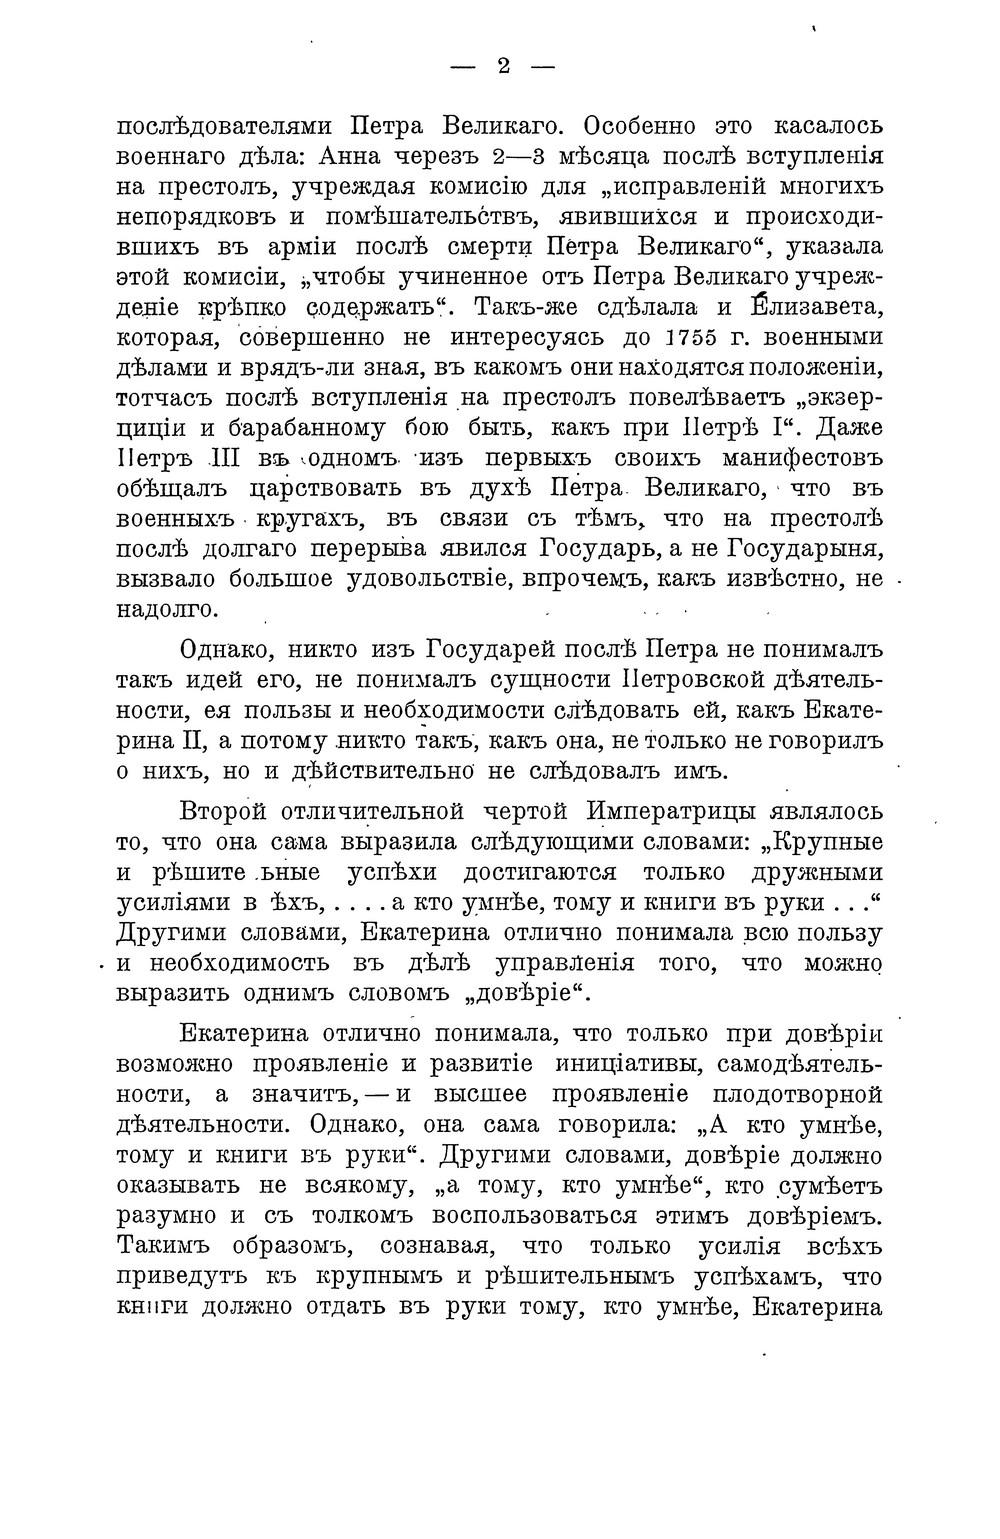 http://i6.imageban.ru/out/2013/11/07/b32c45f30f710b93e7730af529f4433a.jpg